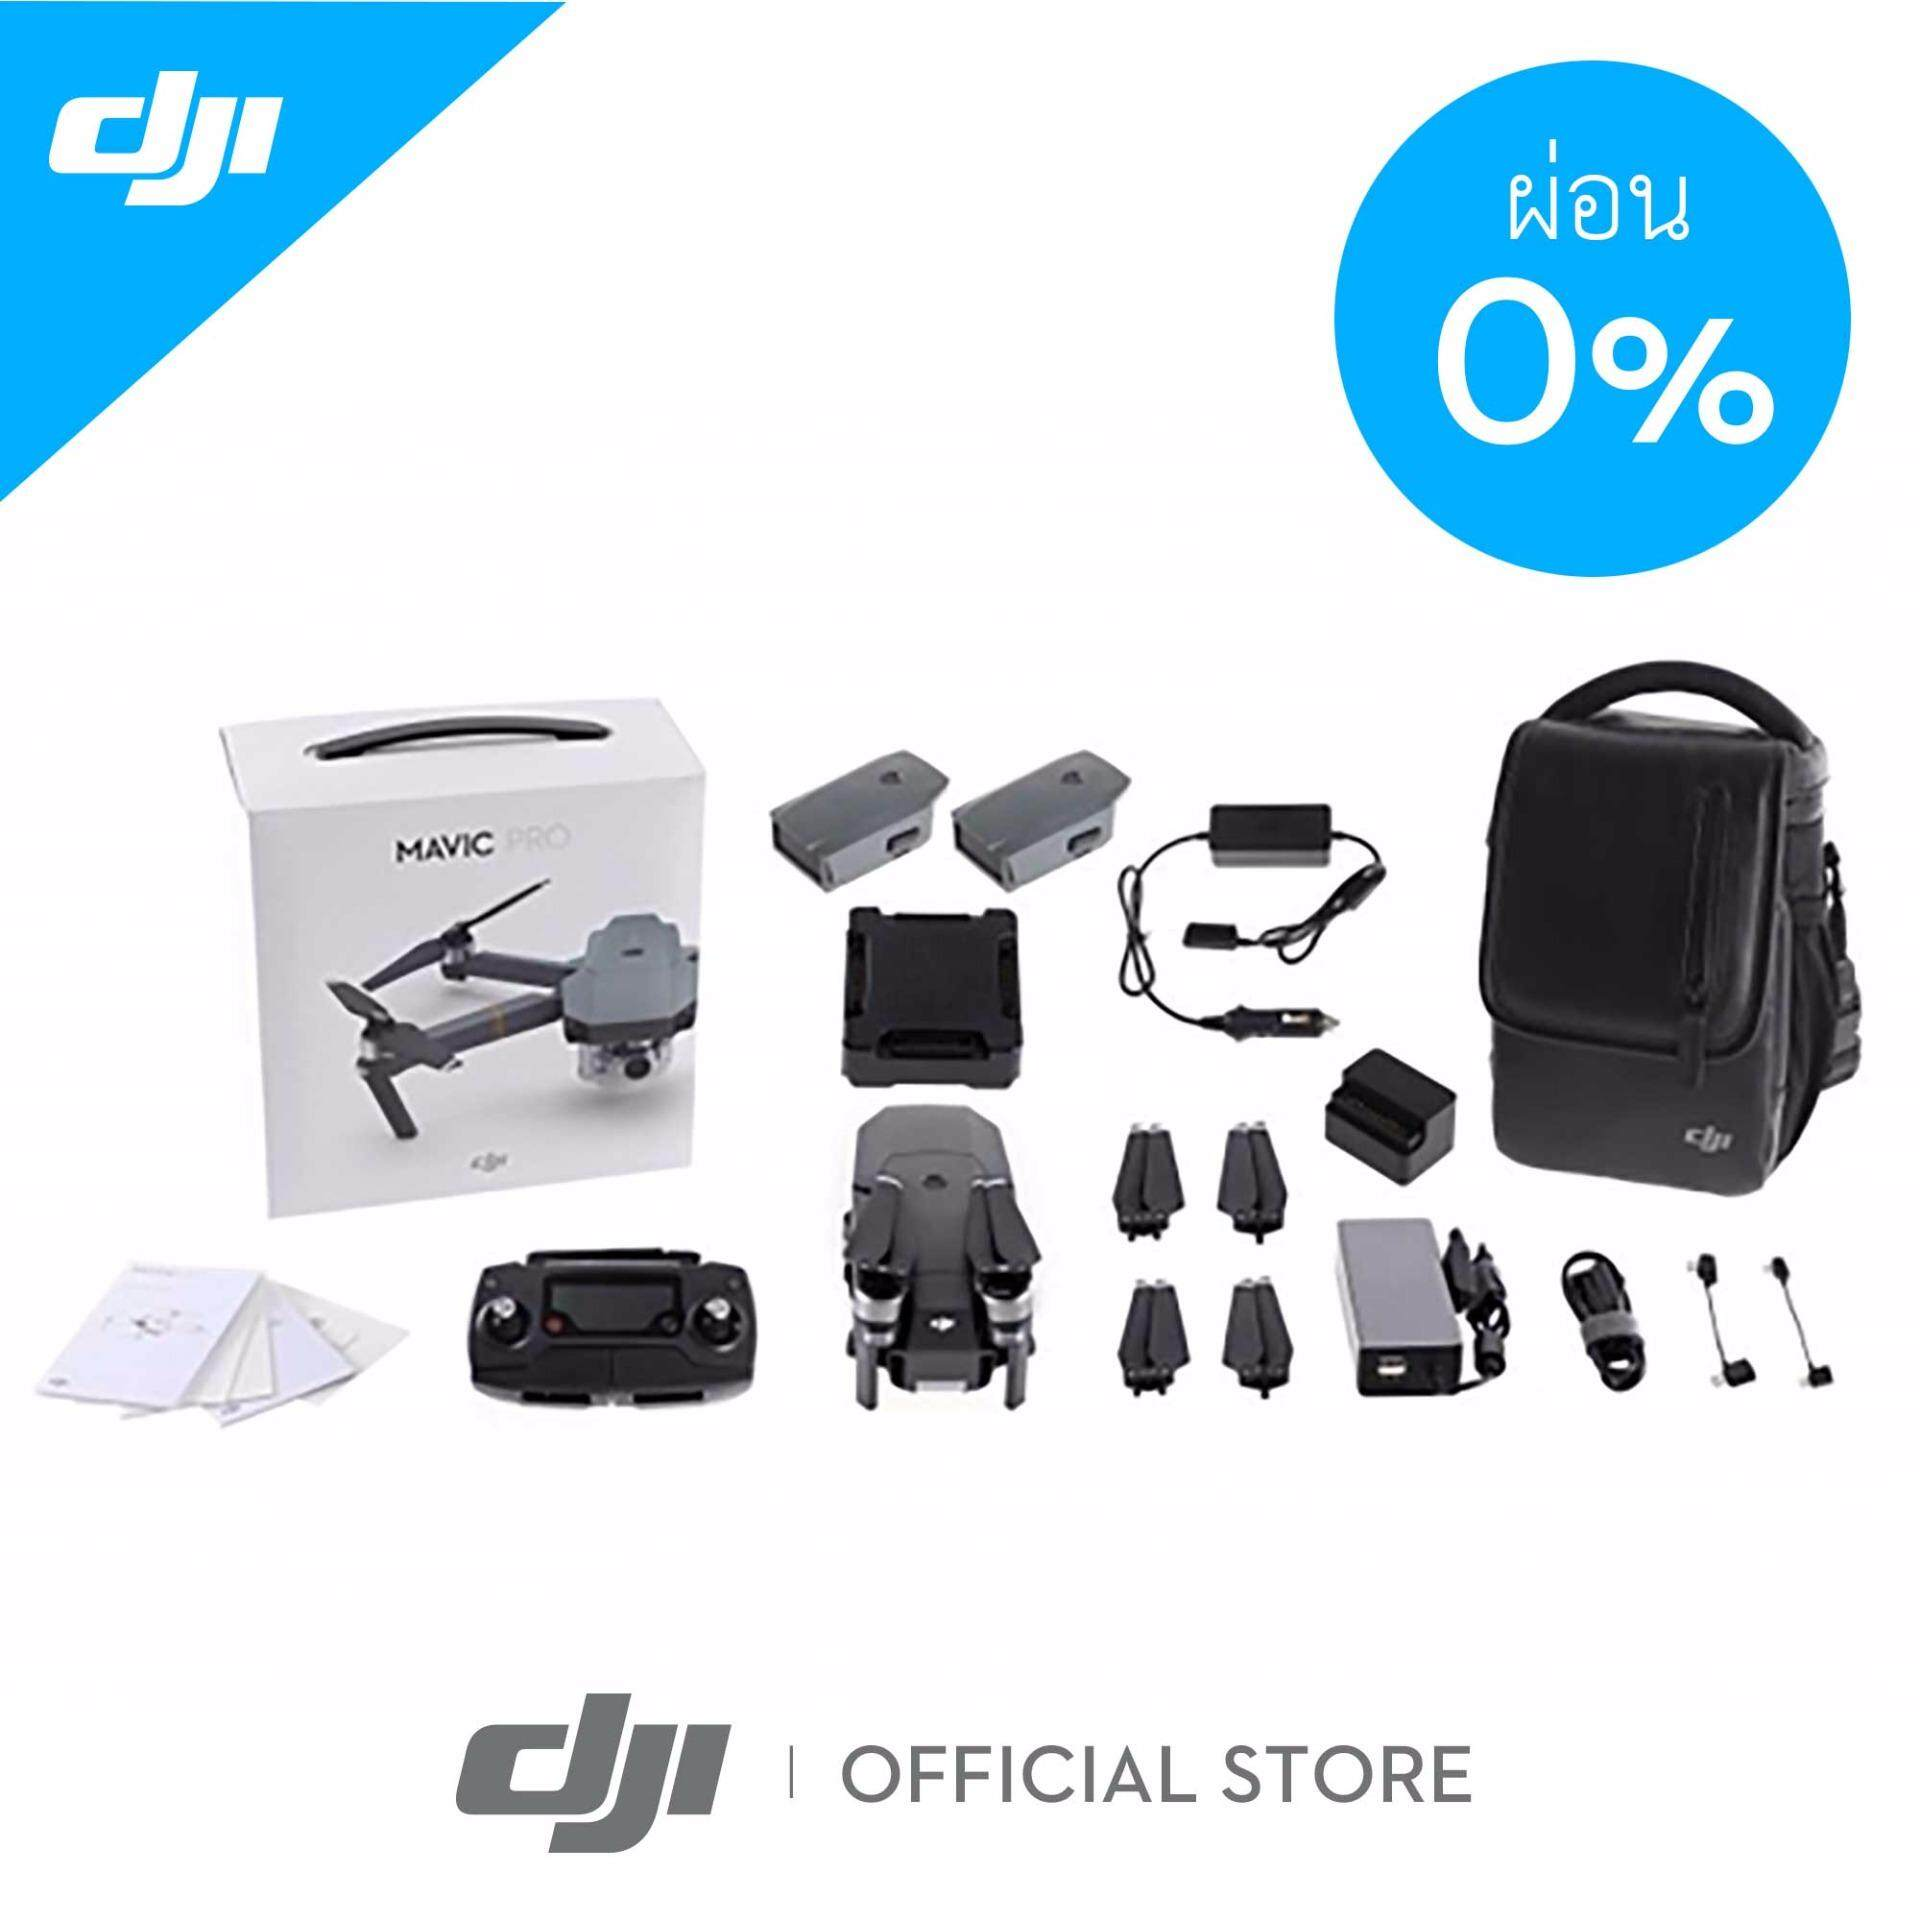 DJI Mavic Pro Fly More Combo - โดรนถ่ายภาพ Mavic Pro พร้อมอุปกรณ์เสริมครบเซ็ต และกระเป๋าเป้